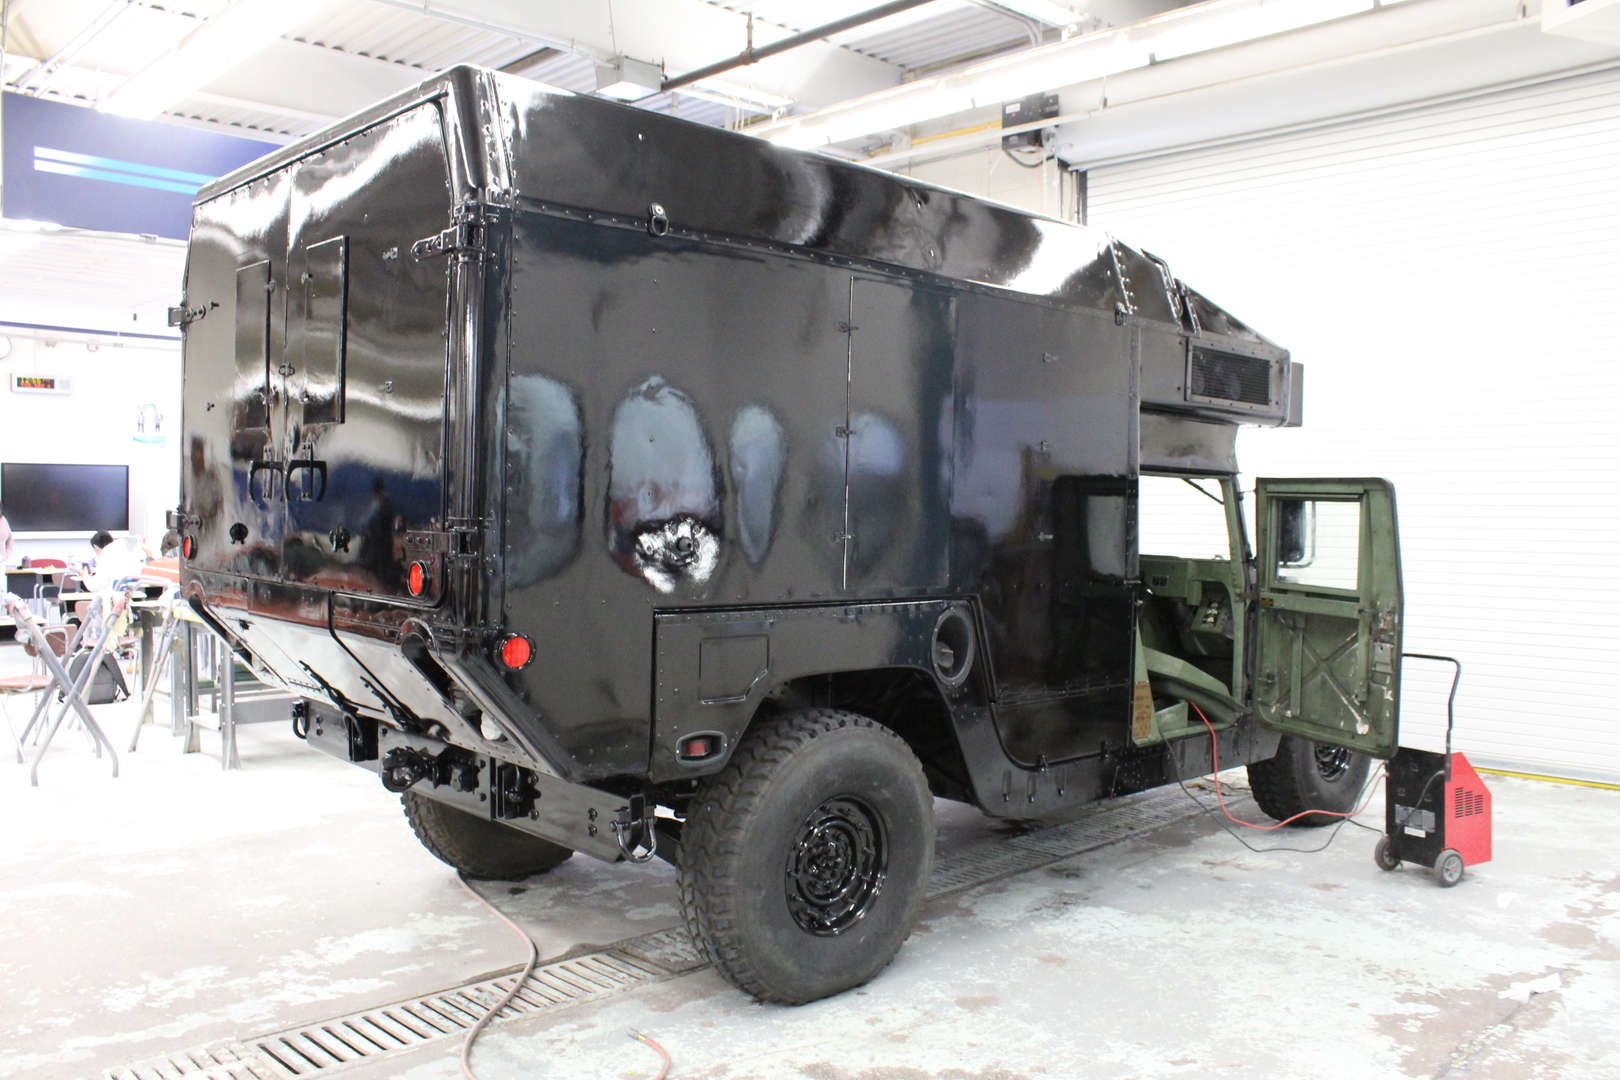 Humvee in garage